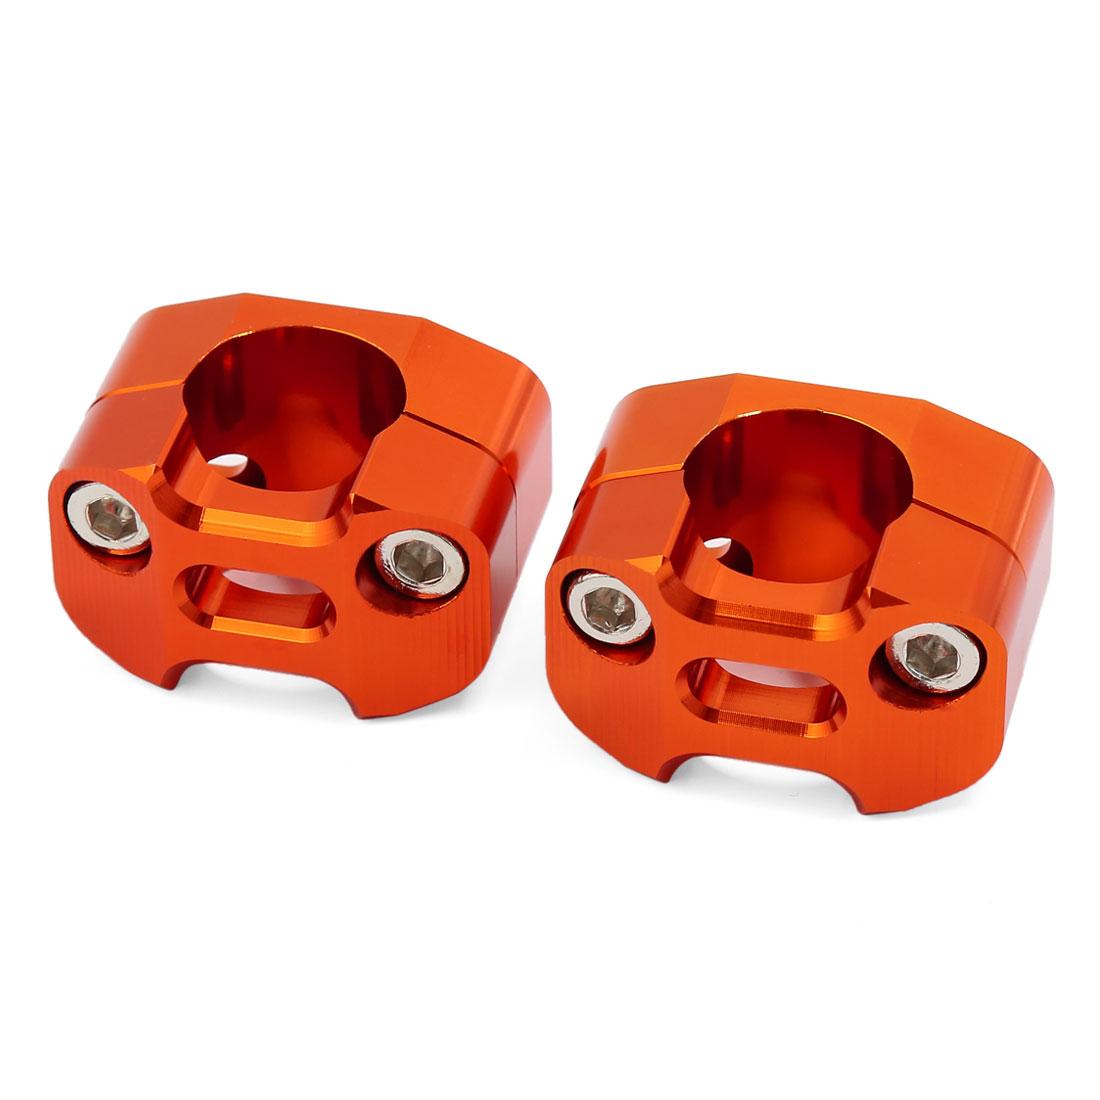 Motorcycle Orange CNC Aluminum Alloy 28mm Fat Handlebar Riser Clamp Adapter 2pcs